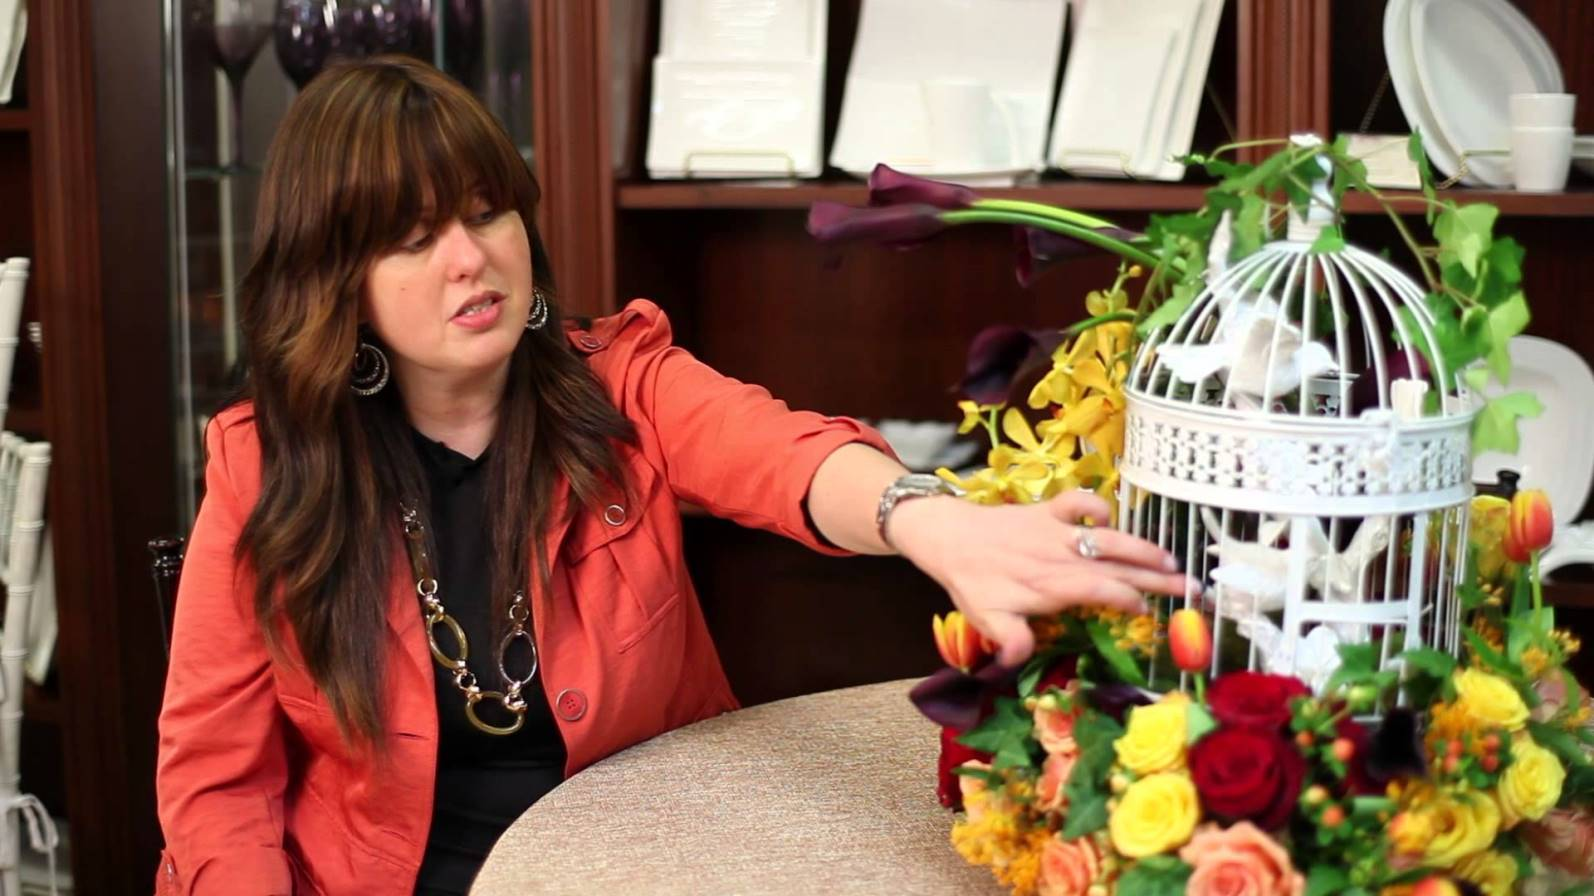 Tammy Carmona Polatsek showing how to use a birdcage as a centerpiece. Photo via YouTube